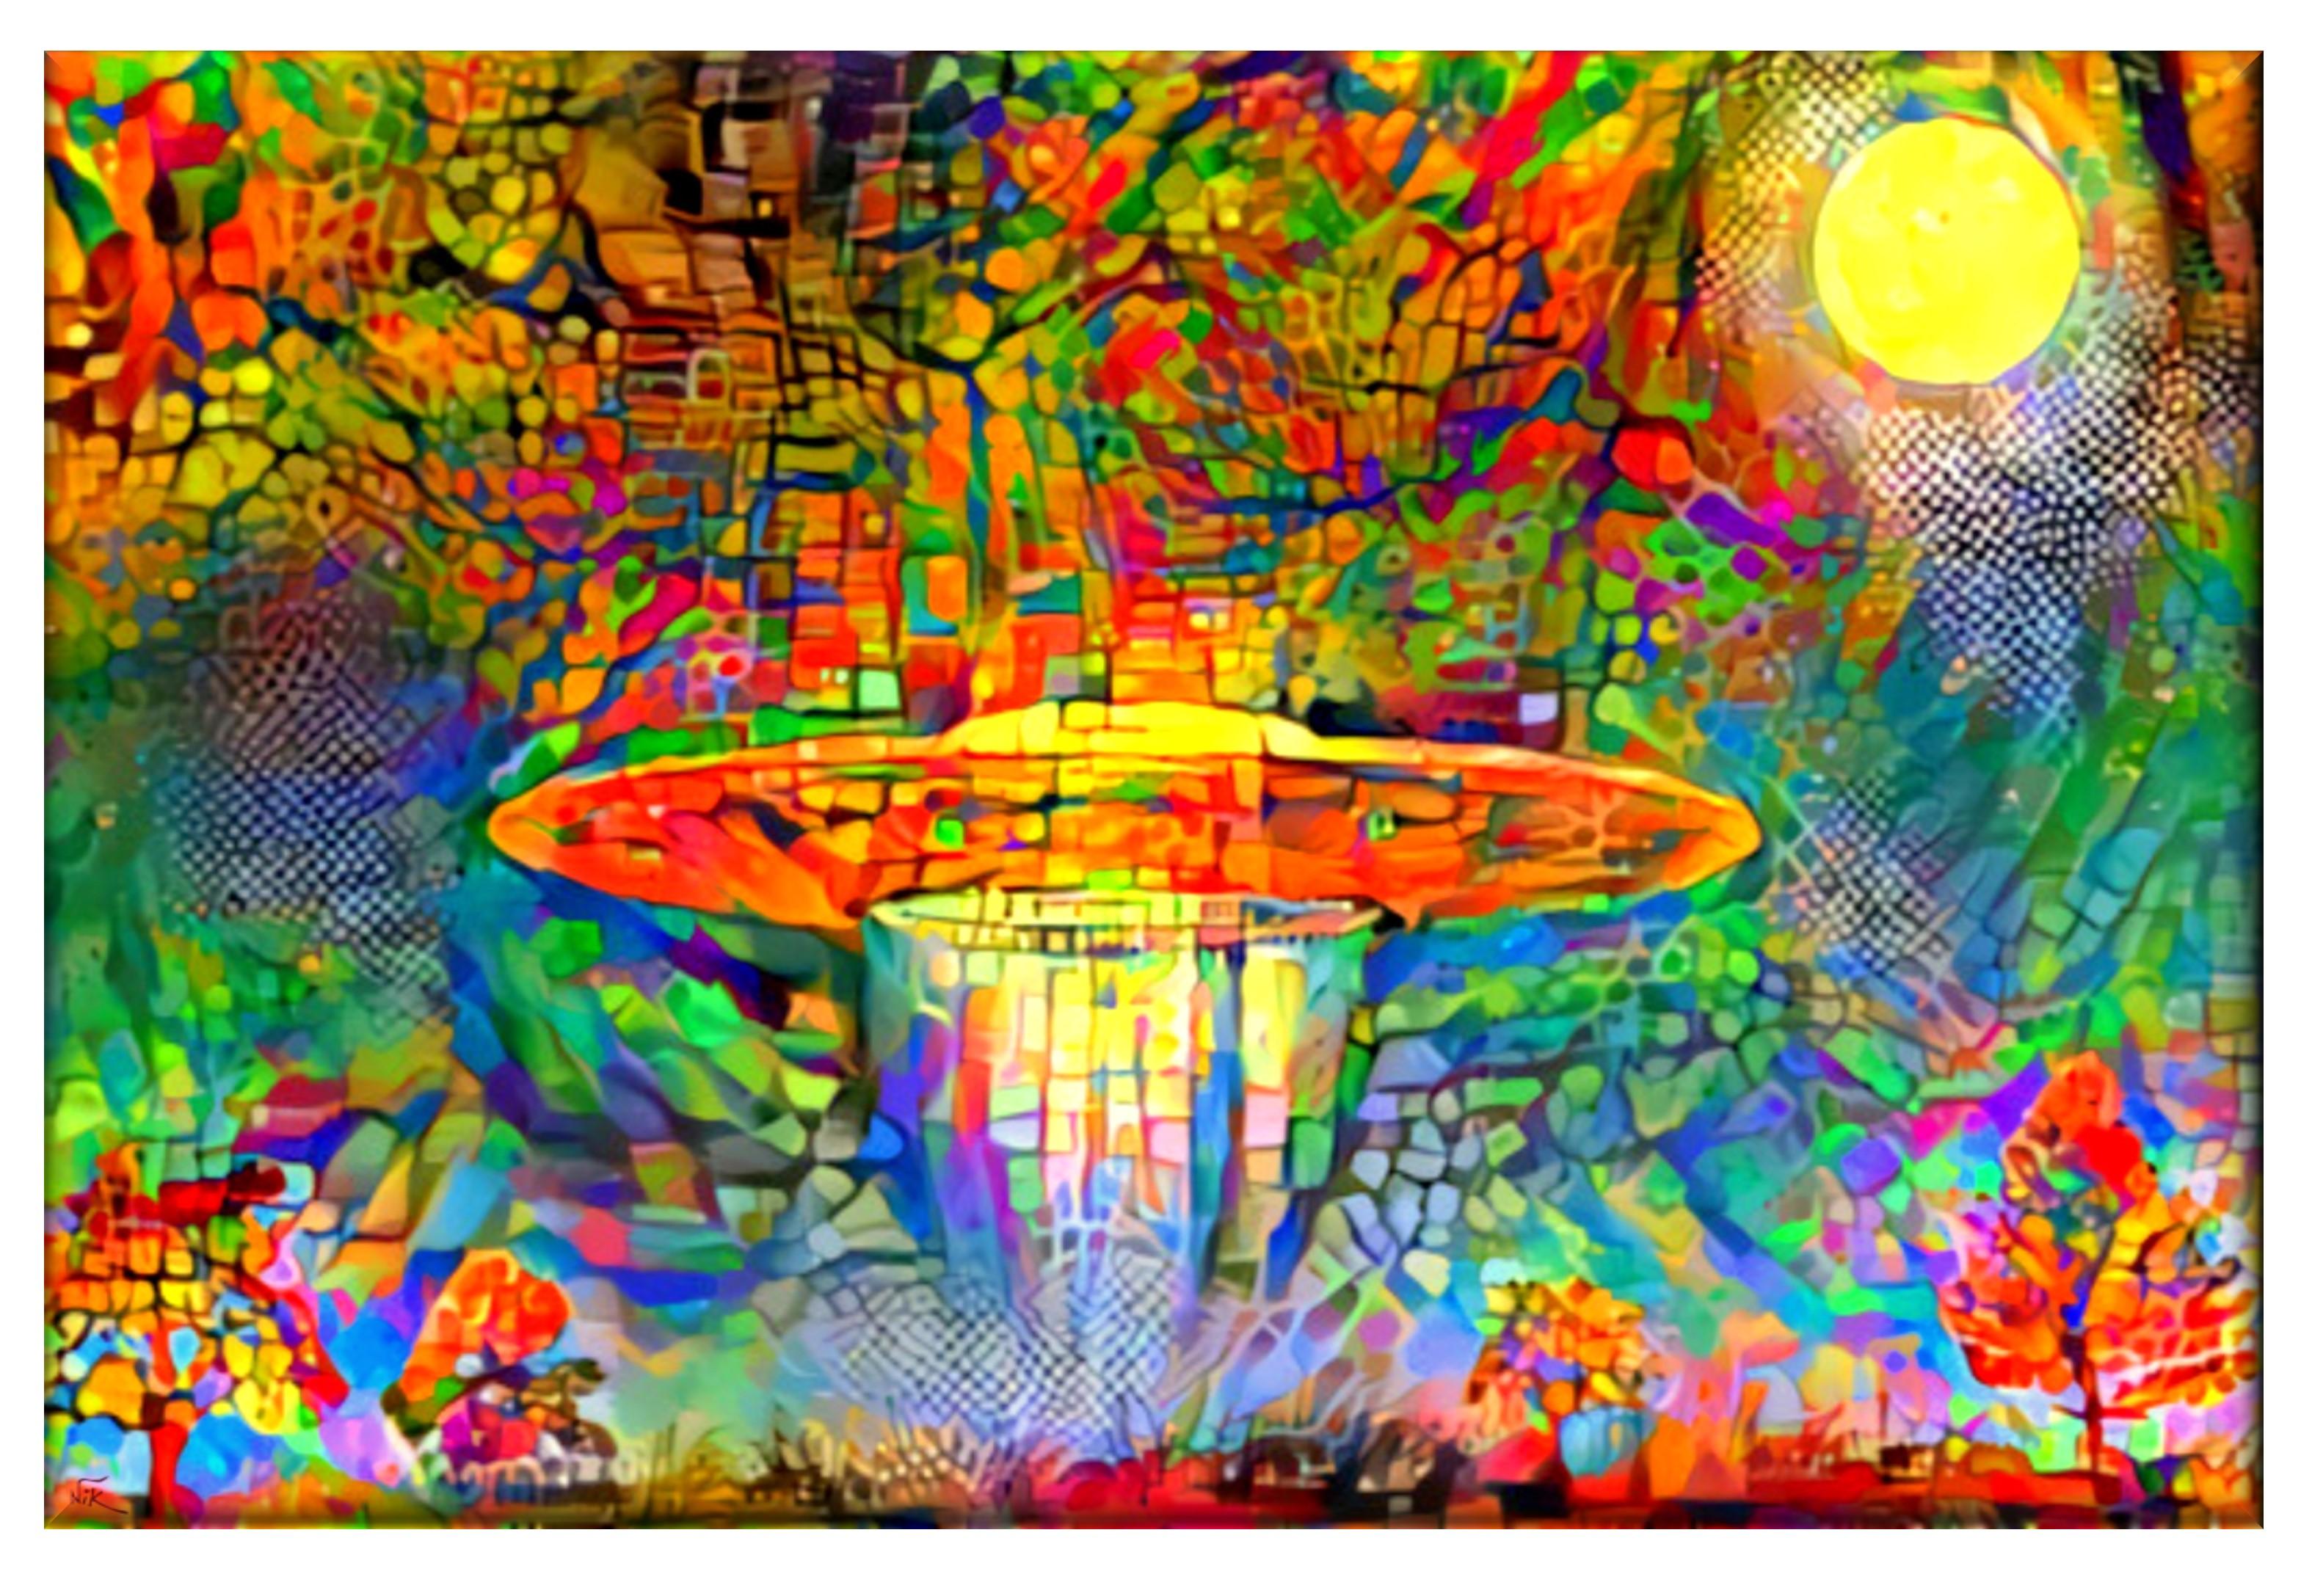 Aliens are coming nik fine arts original paintings and for Original fine art paintings for sale